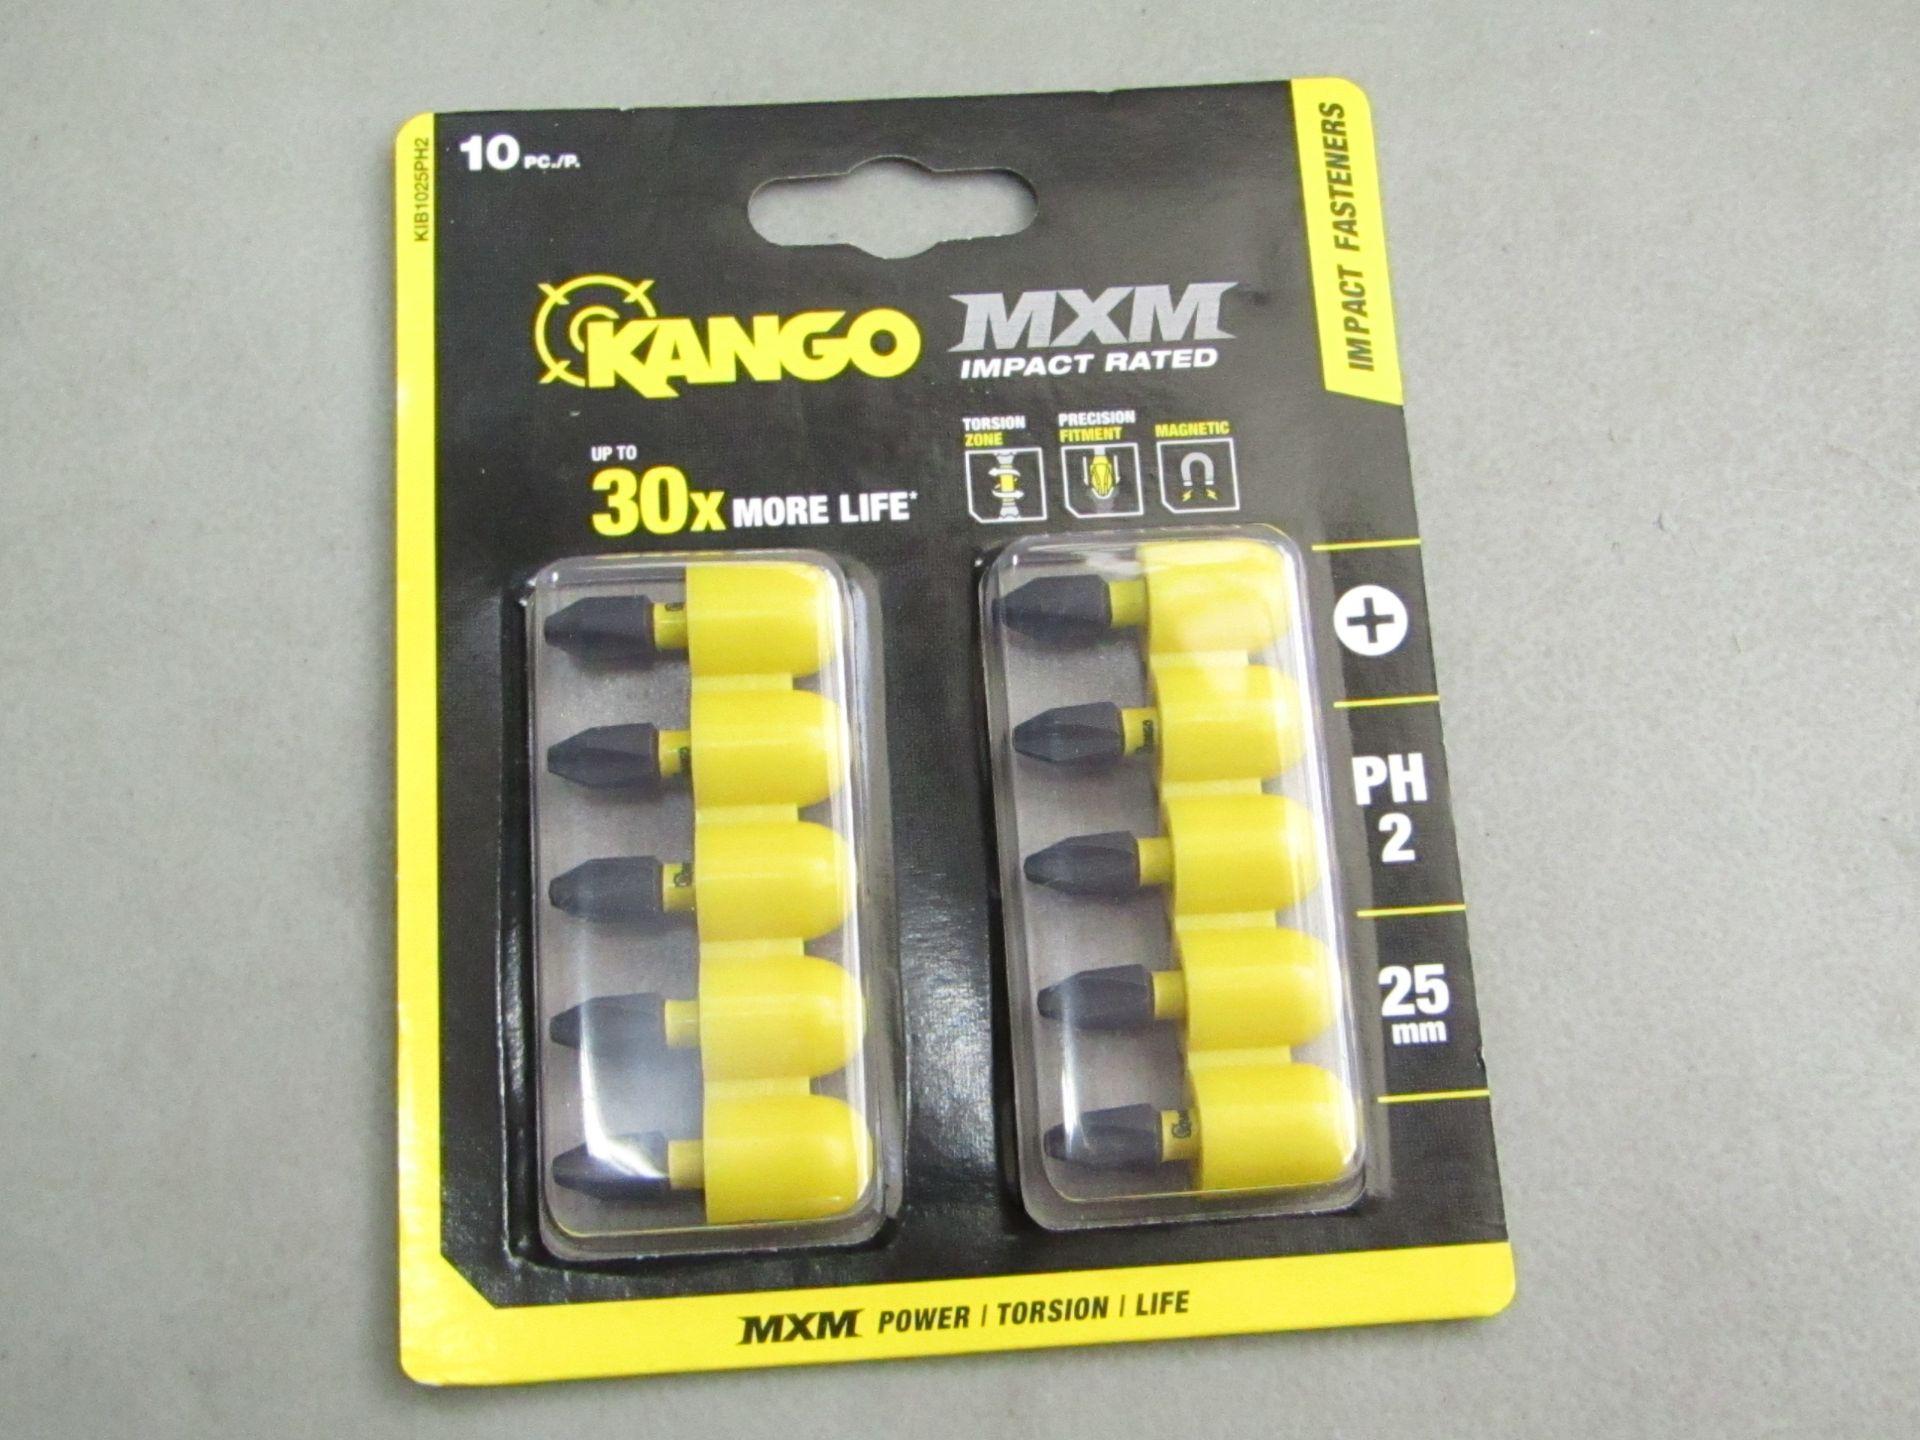 Lot 60 - X1 Kango mxm Impact Fasteners, 25 mm, 10 Pieces